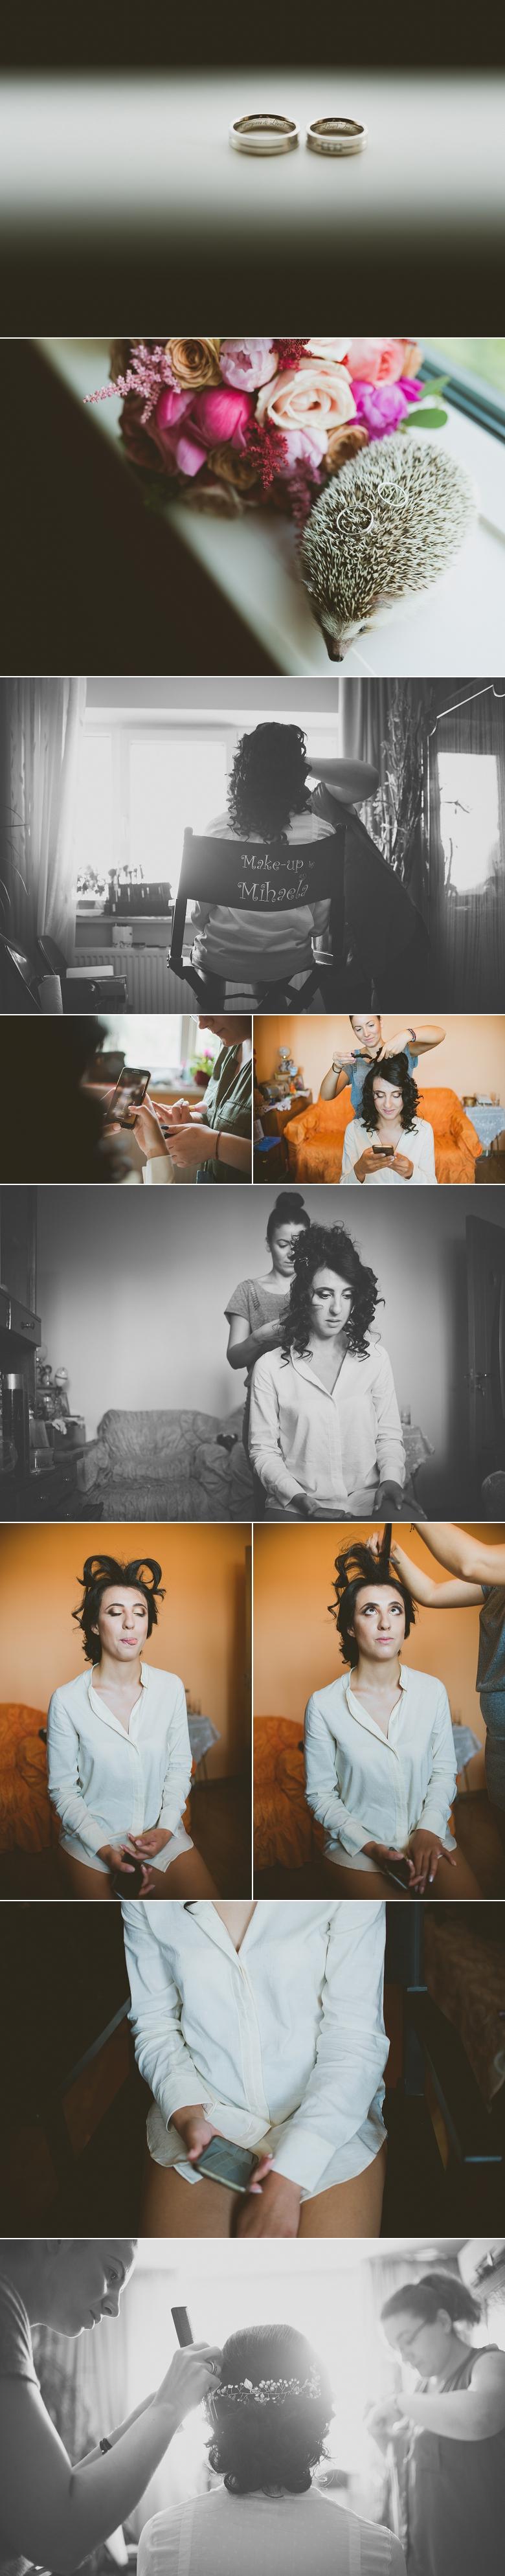 poze_nunta_hexagon_bucuresti_foto_video_nunta_4k_mihai_albu_photography-1